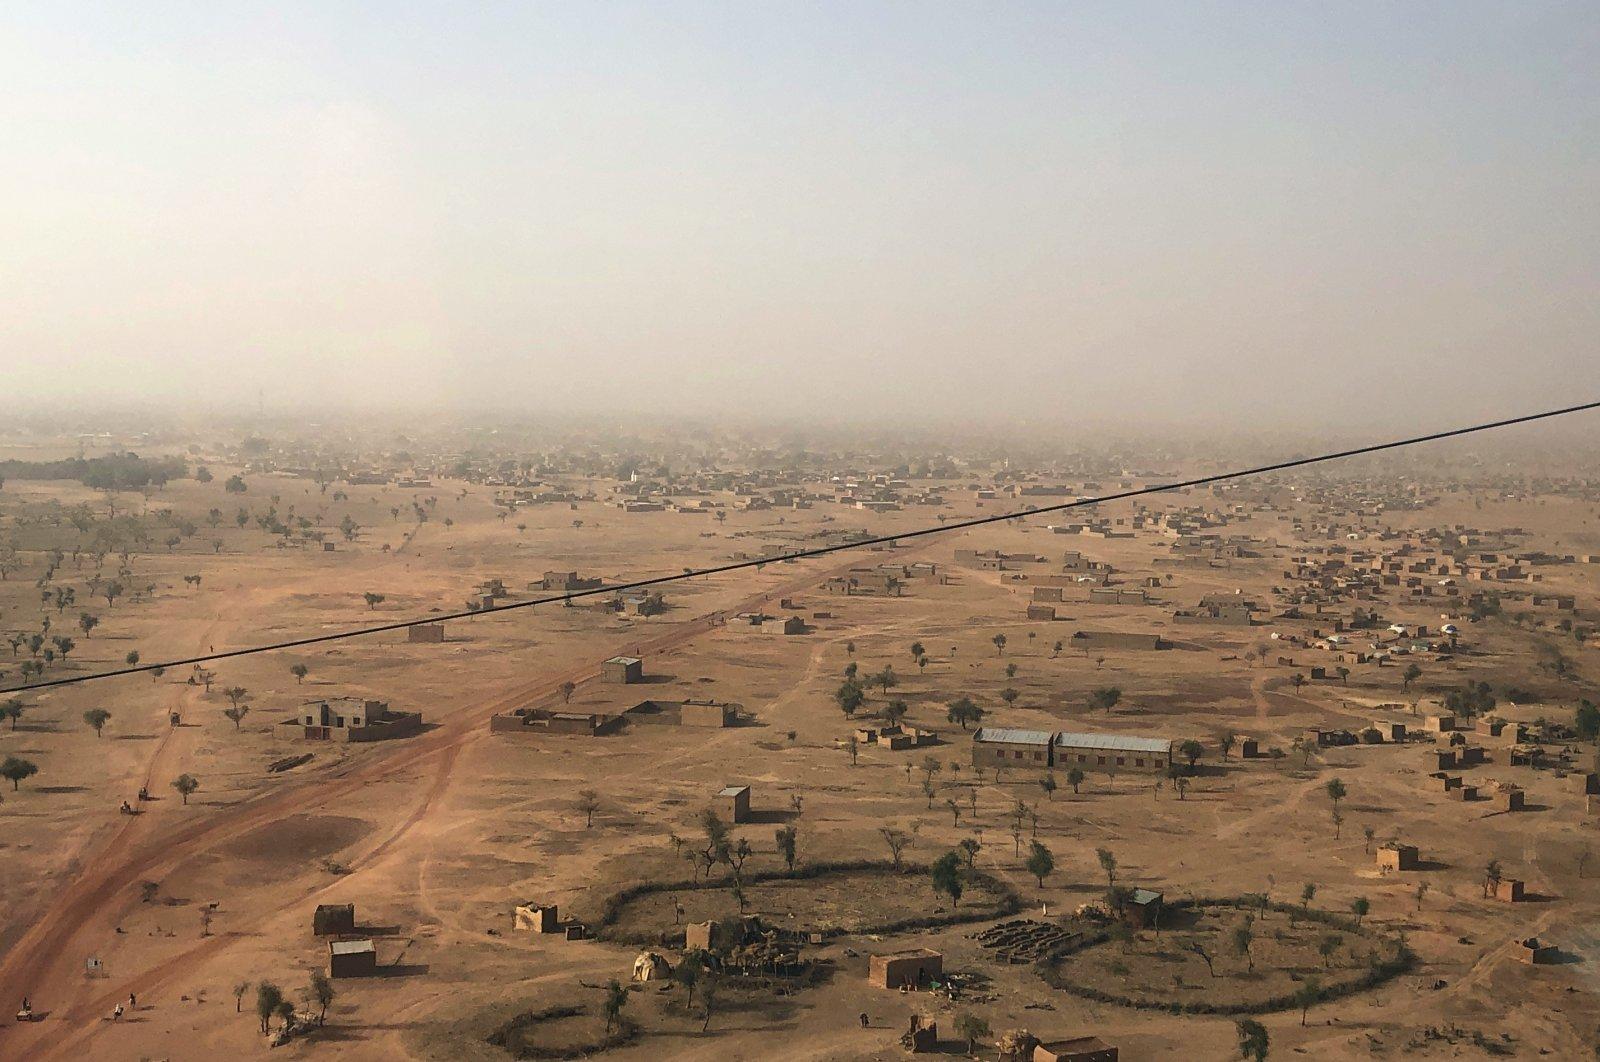 Aerial view of Djibo town, the epicenter of Burkina Faso's conflict, Burkina Faso, Feb. 18, 2021. (AP Photo)